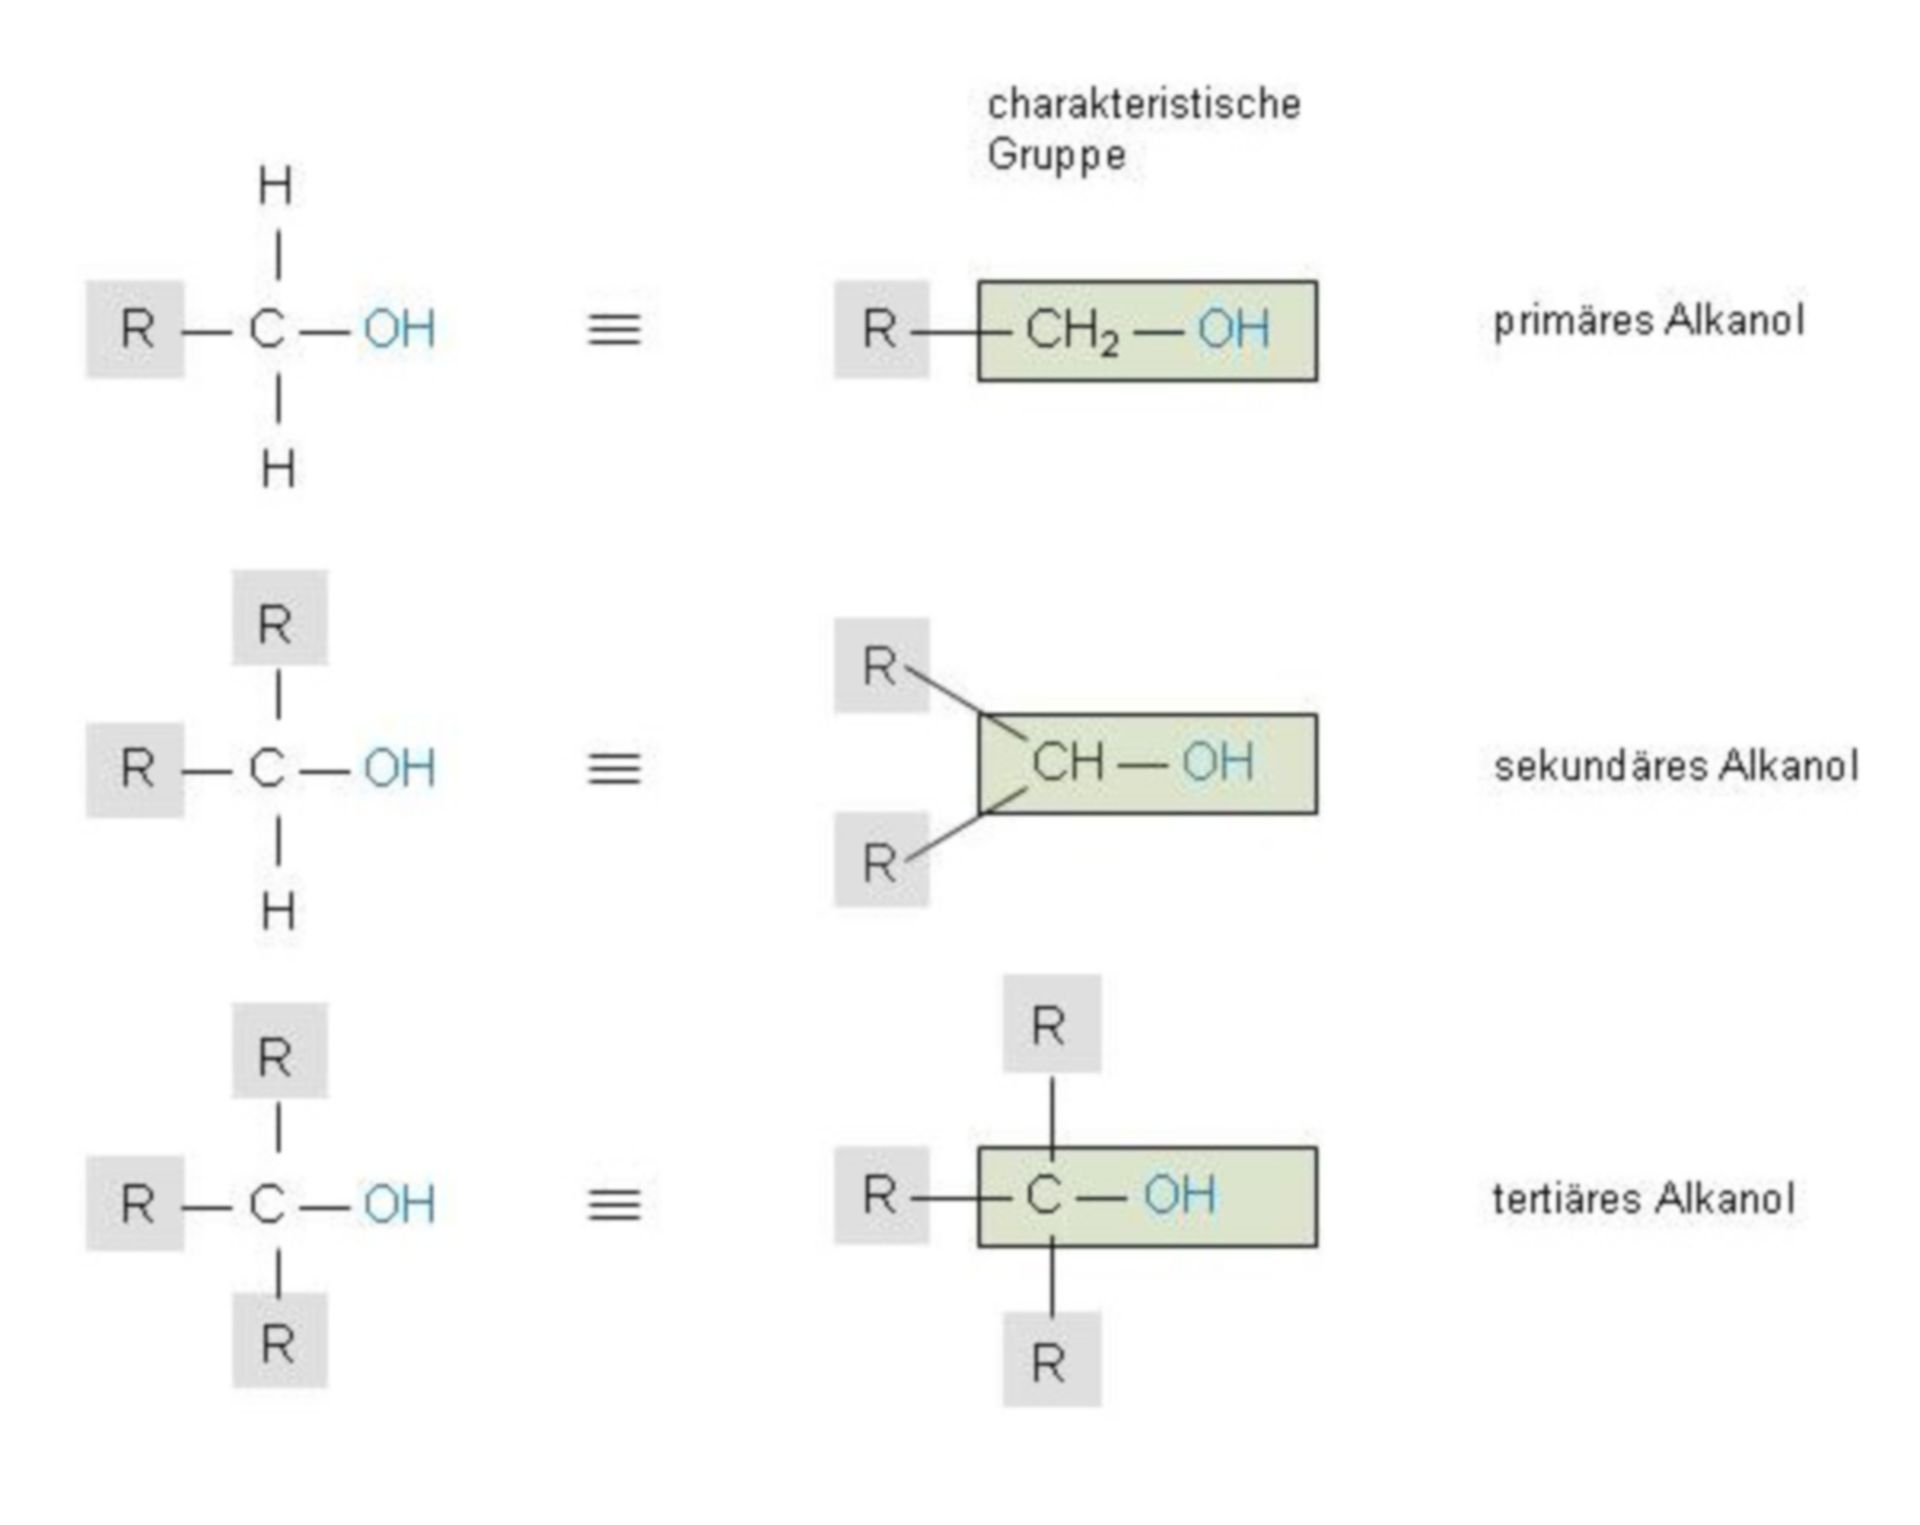 Primäres, sekundäres und tertiäres Alkanol